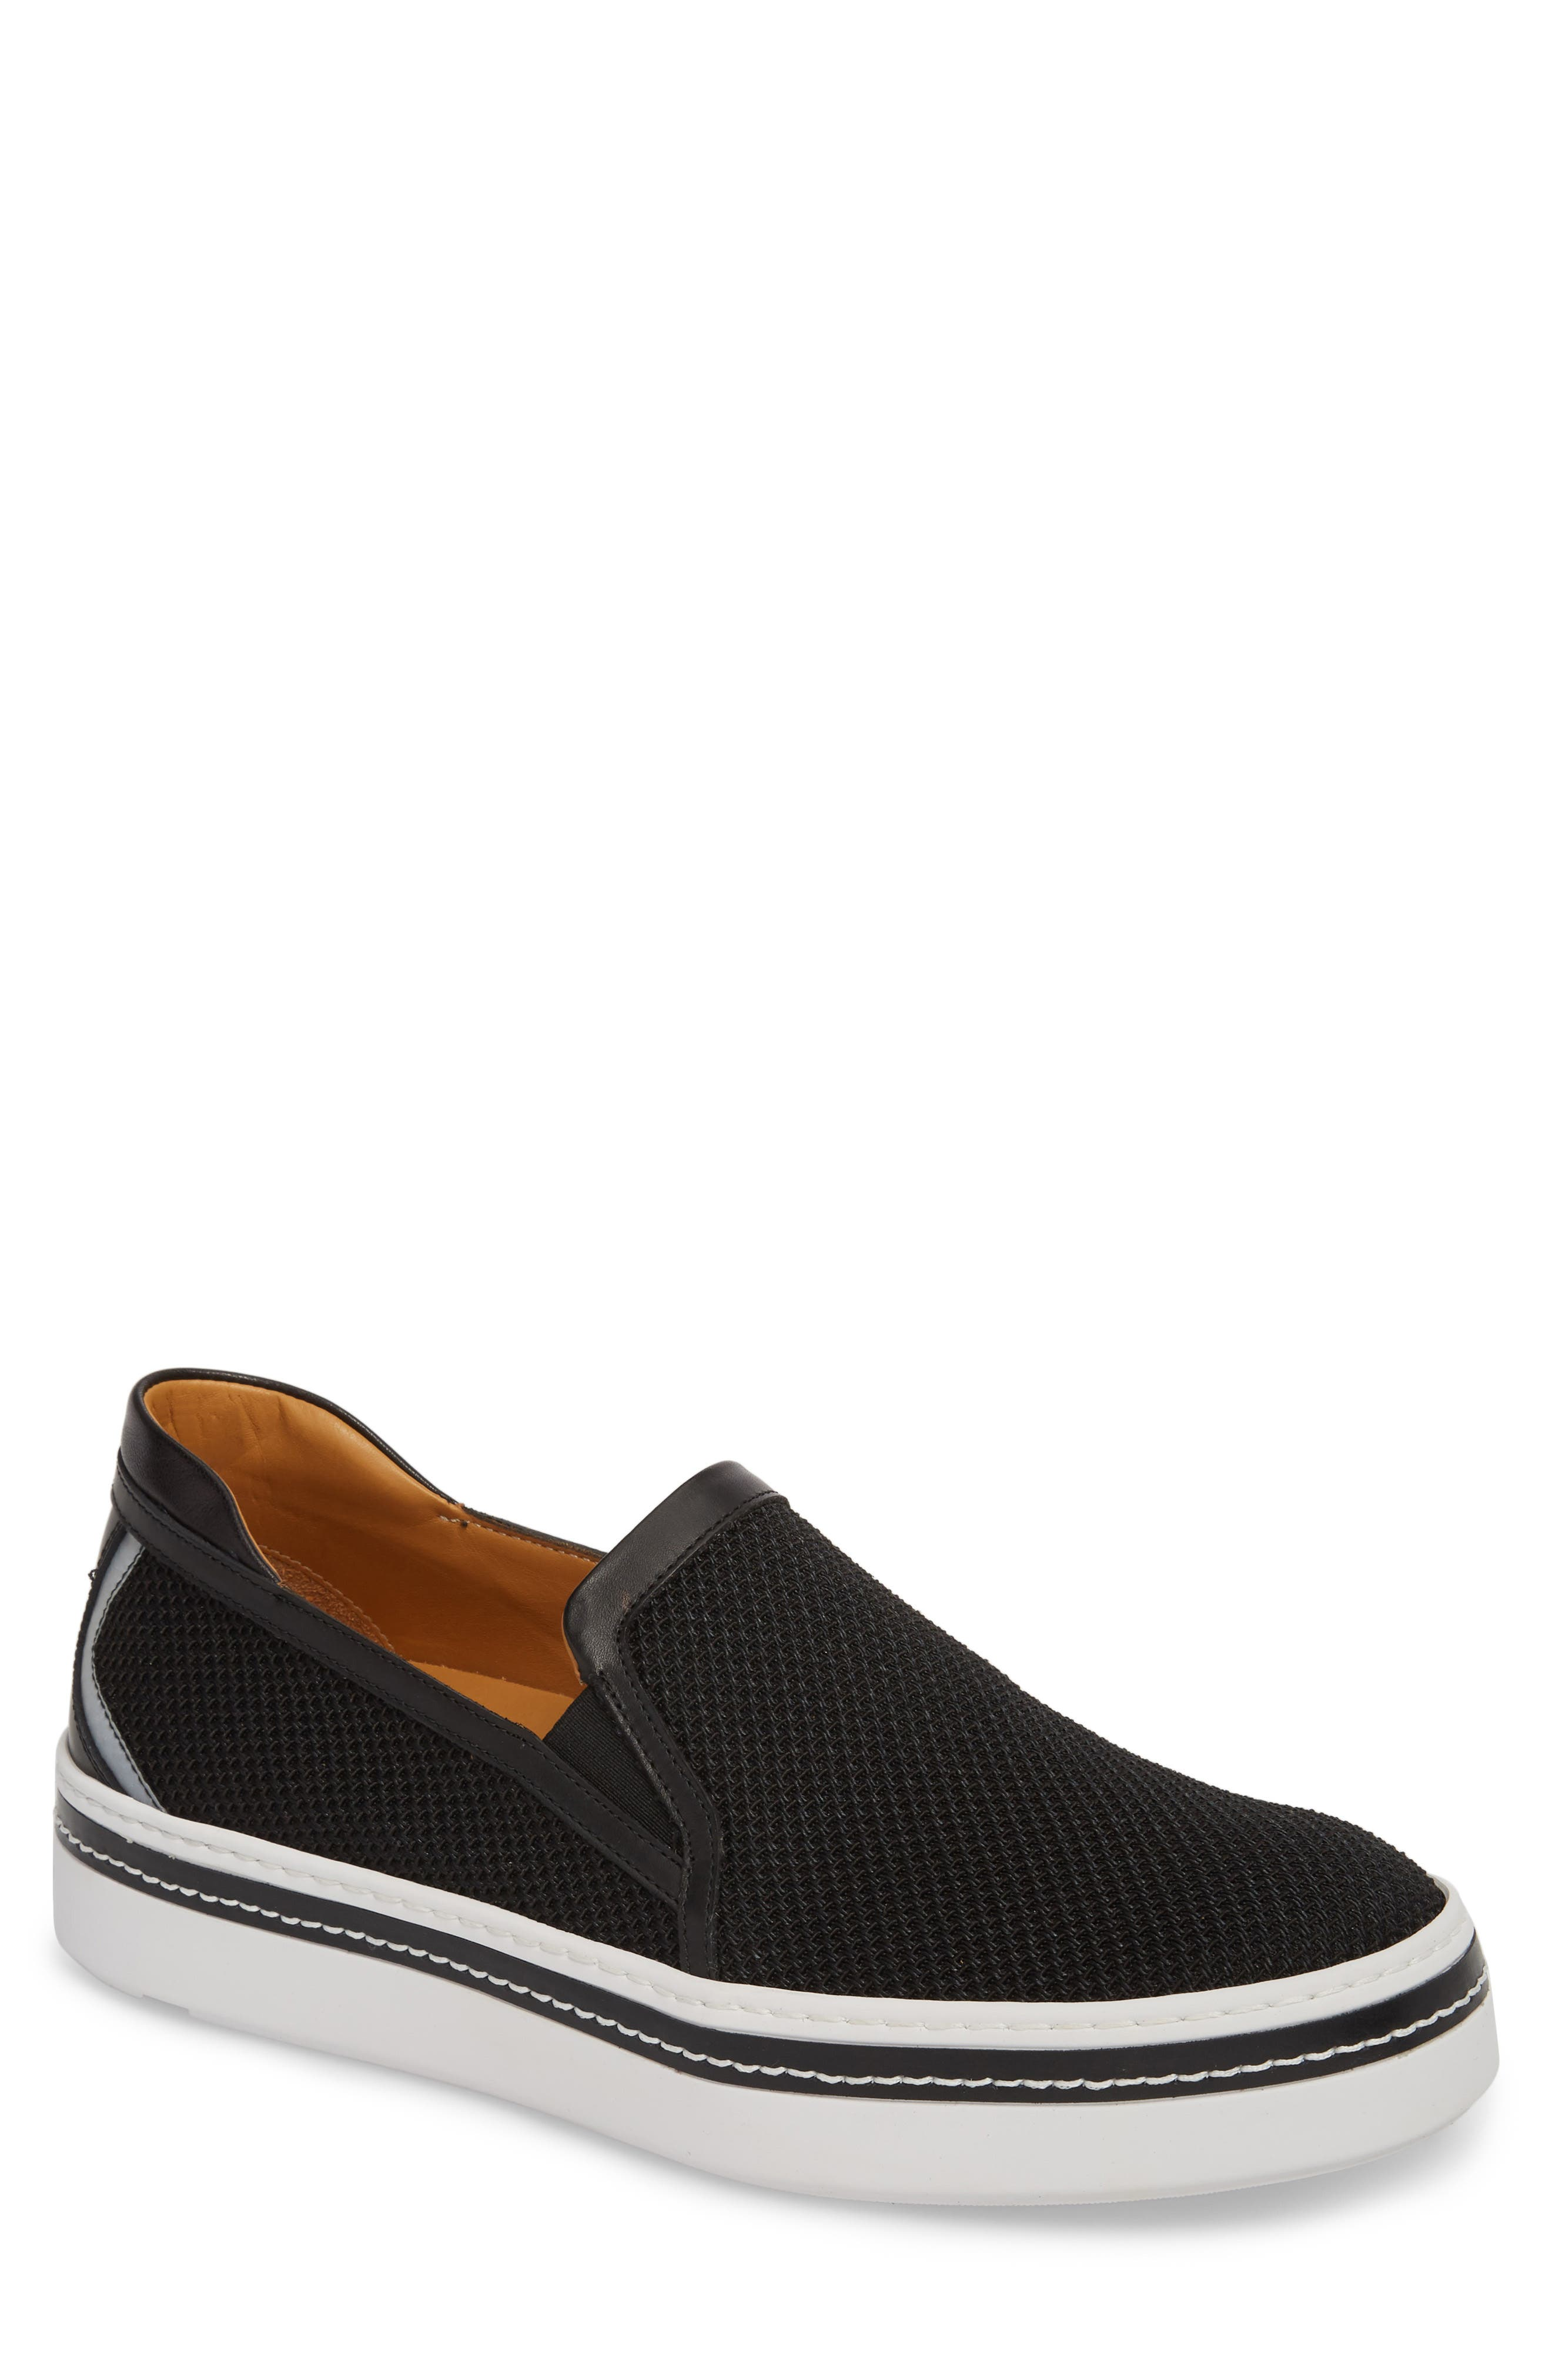 Sal Mesh Slip-On Sneaker,                             Main thumbnail 1, color,                             Black Mesh